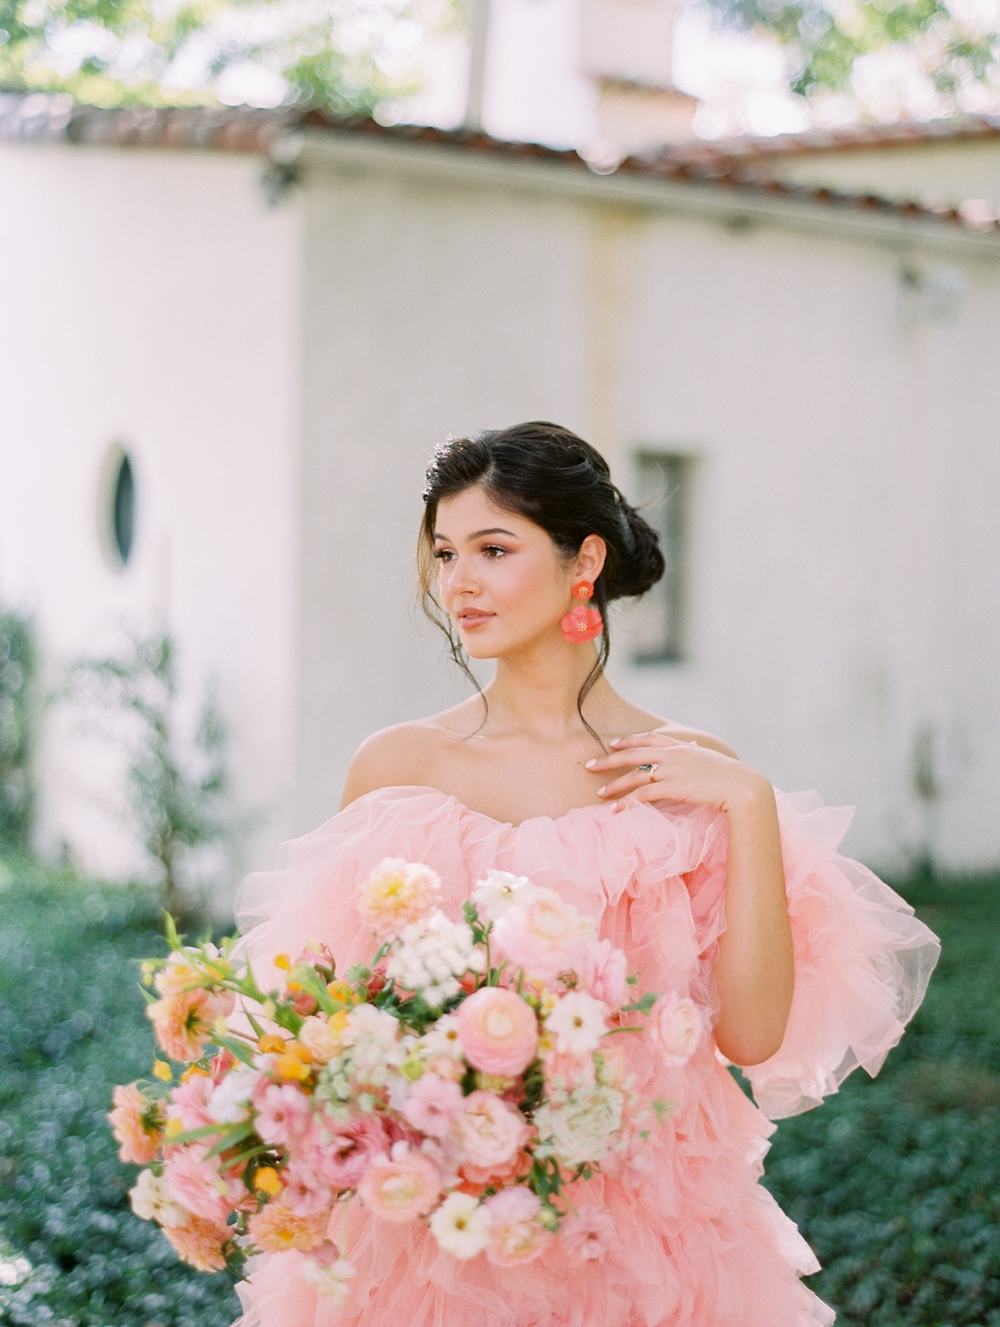 kristin-la-voie-photography-DALLAS-WEDDING-BRIDAL-PHOTOGRAPHER-BOTANICAL-ARBORETUM-95